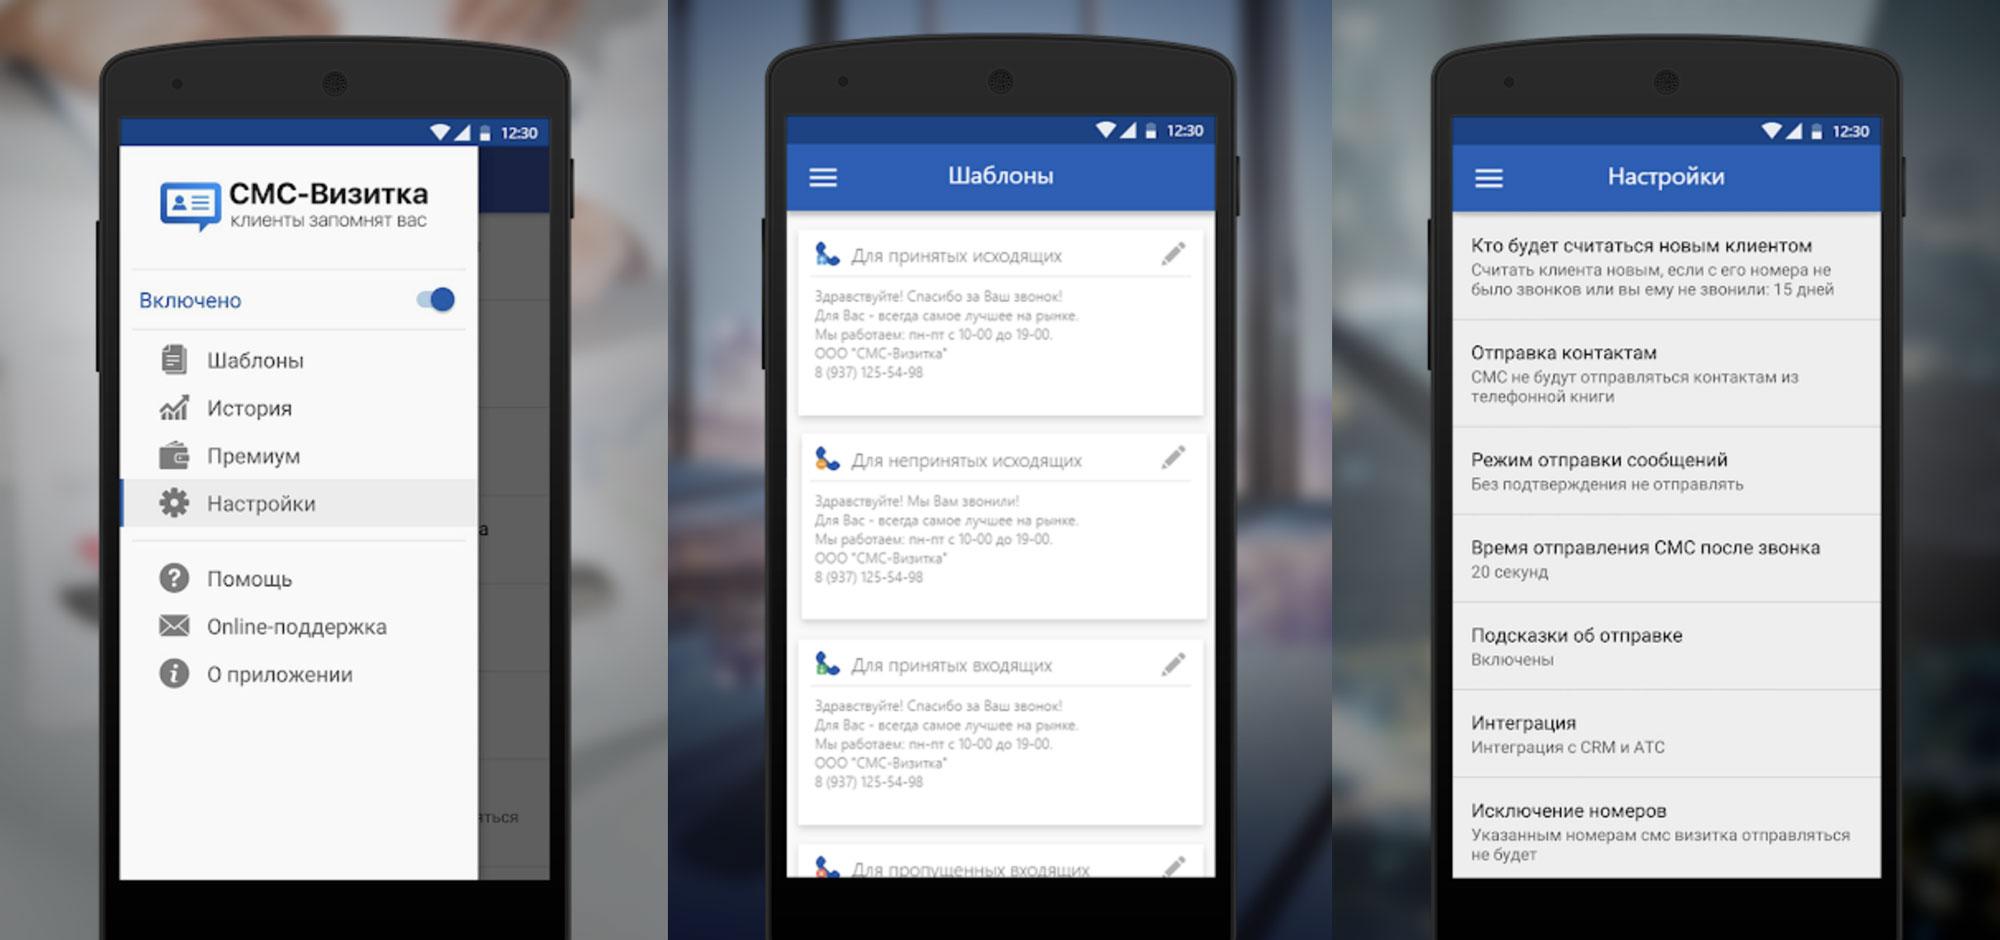 SMS-визитка скриншот